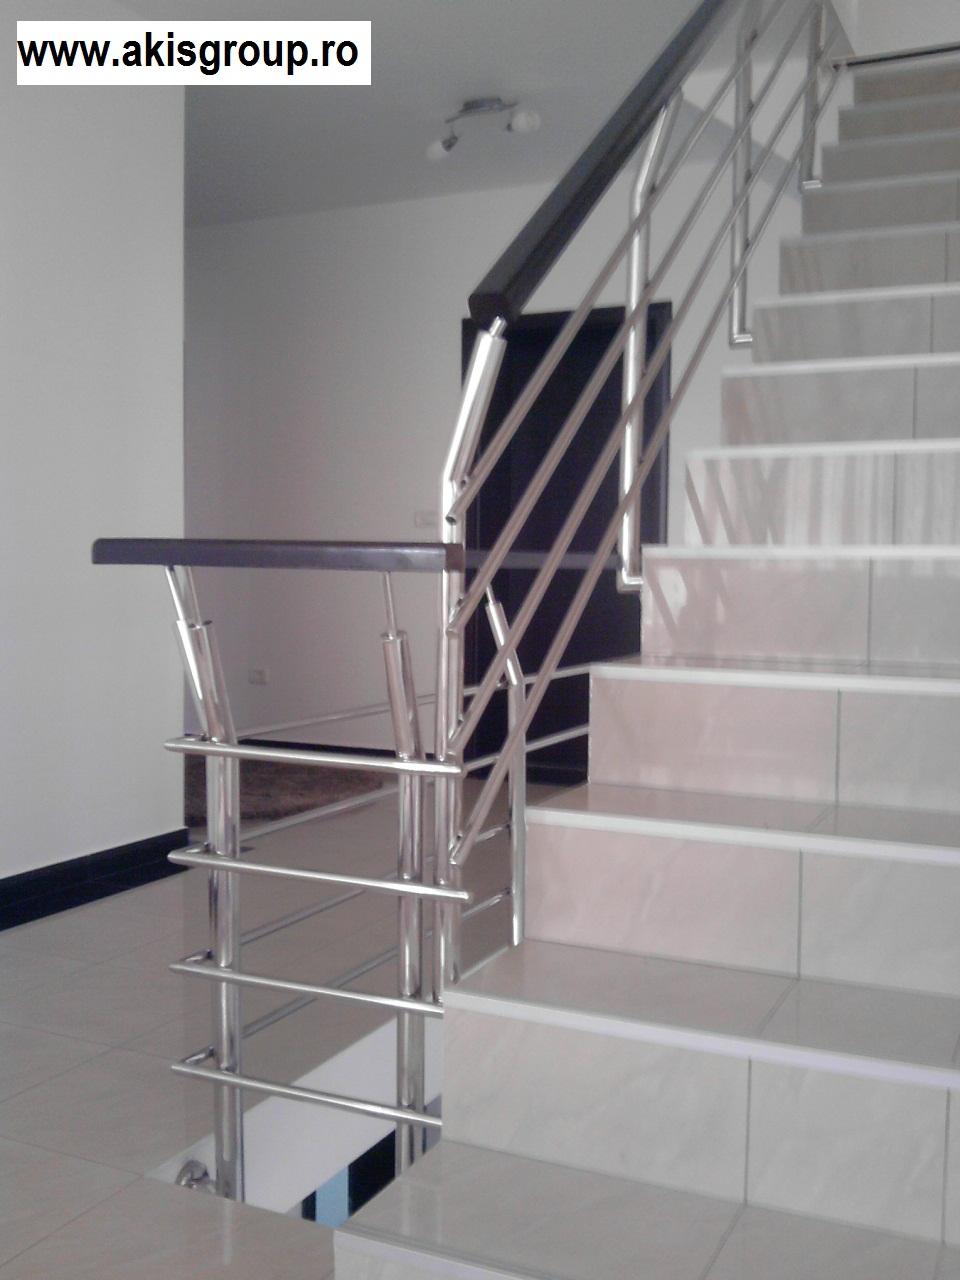 balustrade inox balustrade inox de interior si balustrade. Black Bedroom Furniture Sets. Home Design Ideas